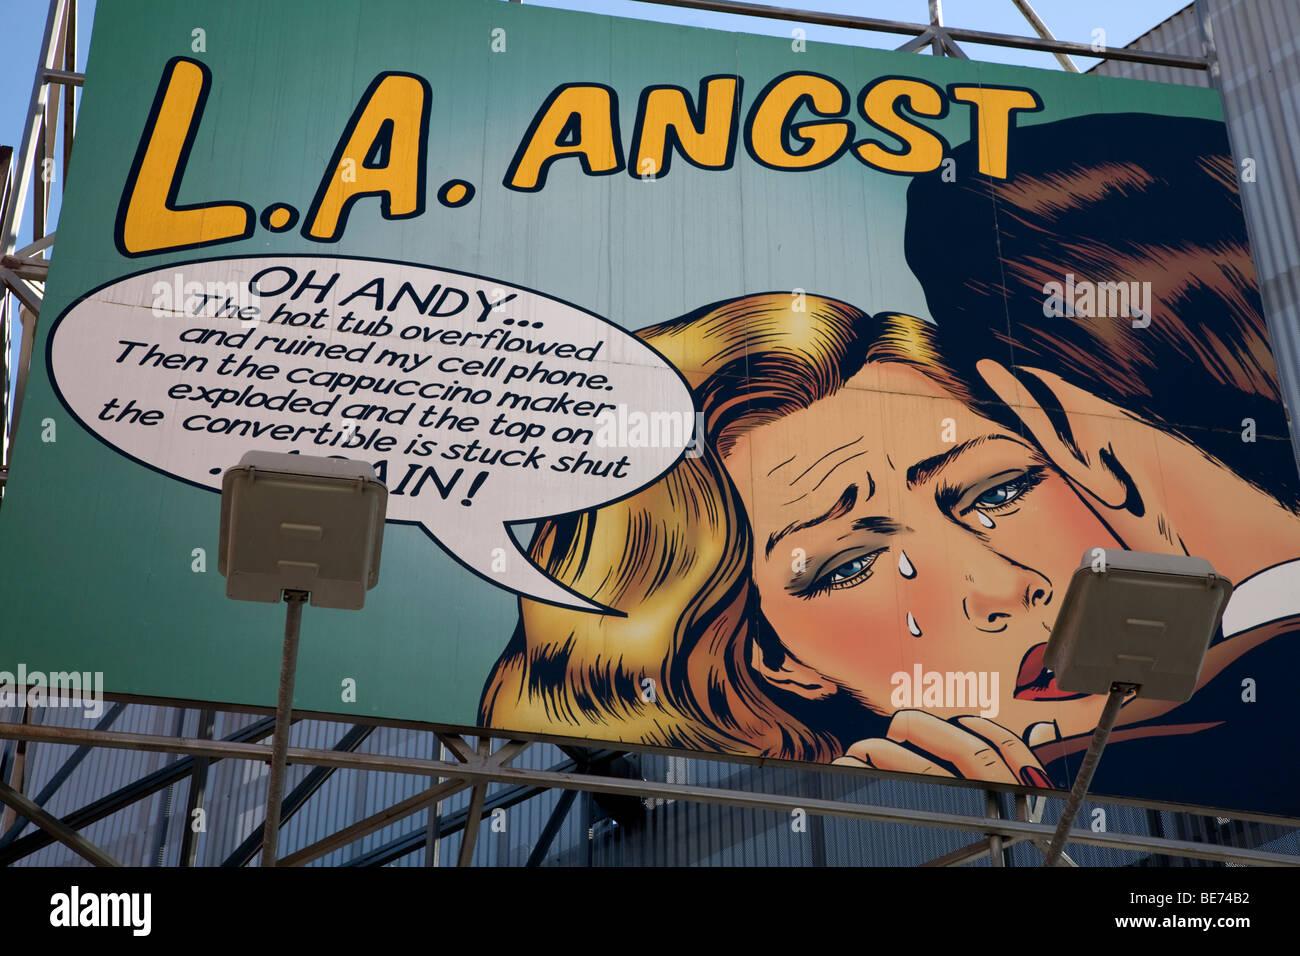 Pop Art Billboard Depicting Film Characters In LA Angst Los Angeles California - Stock Image